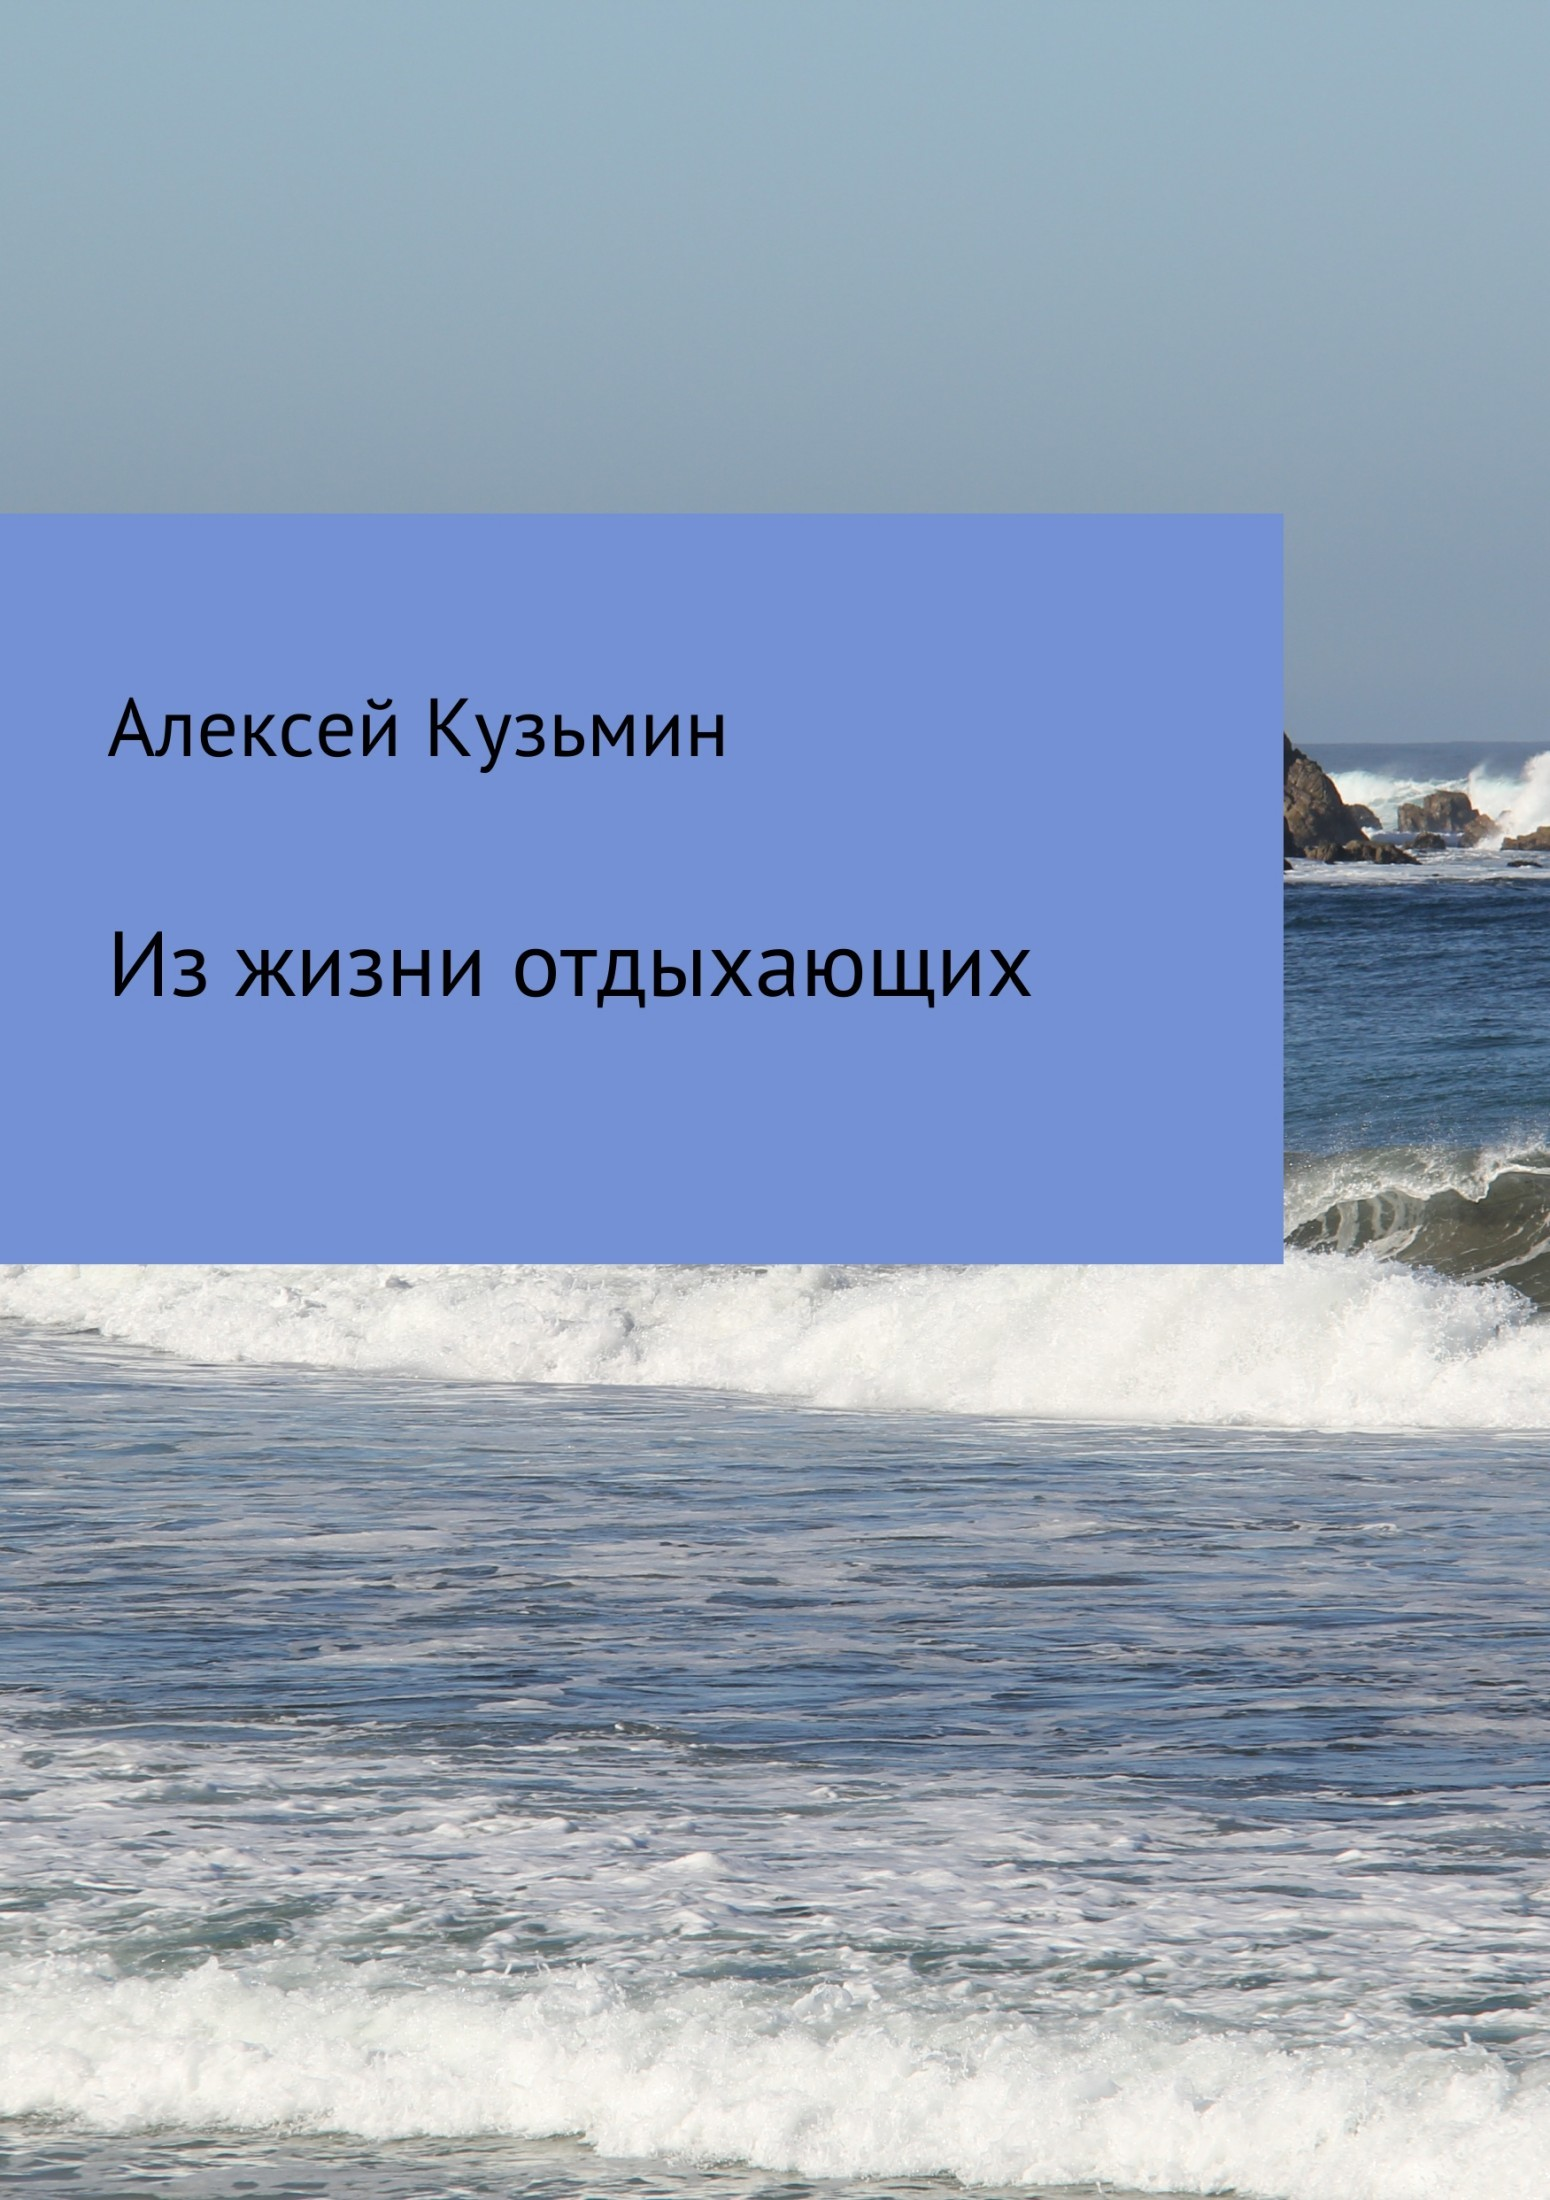 Алексей Борисович Кузьмин бесплатно